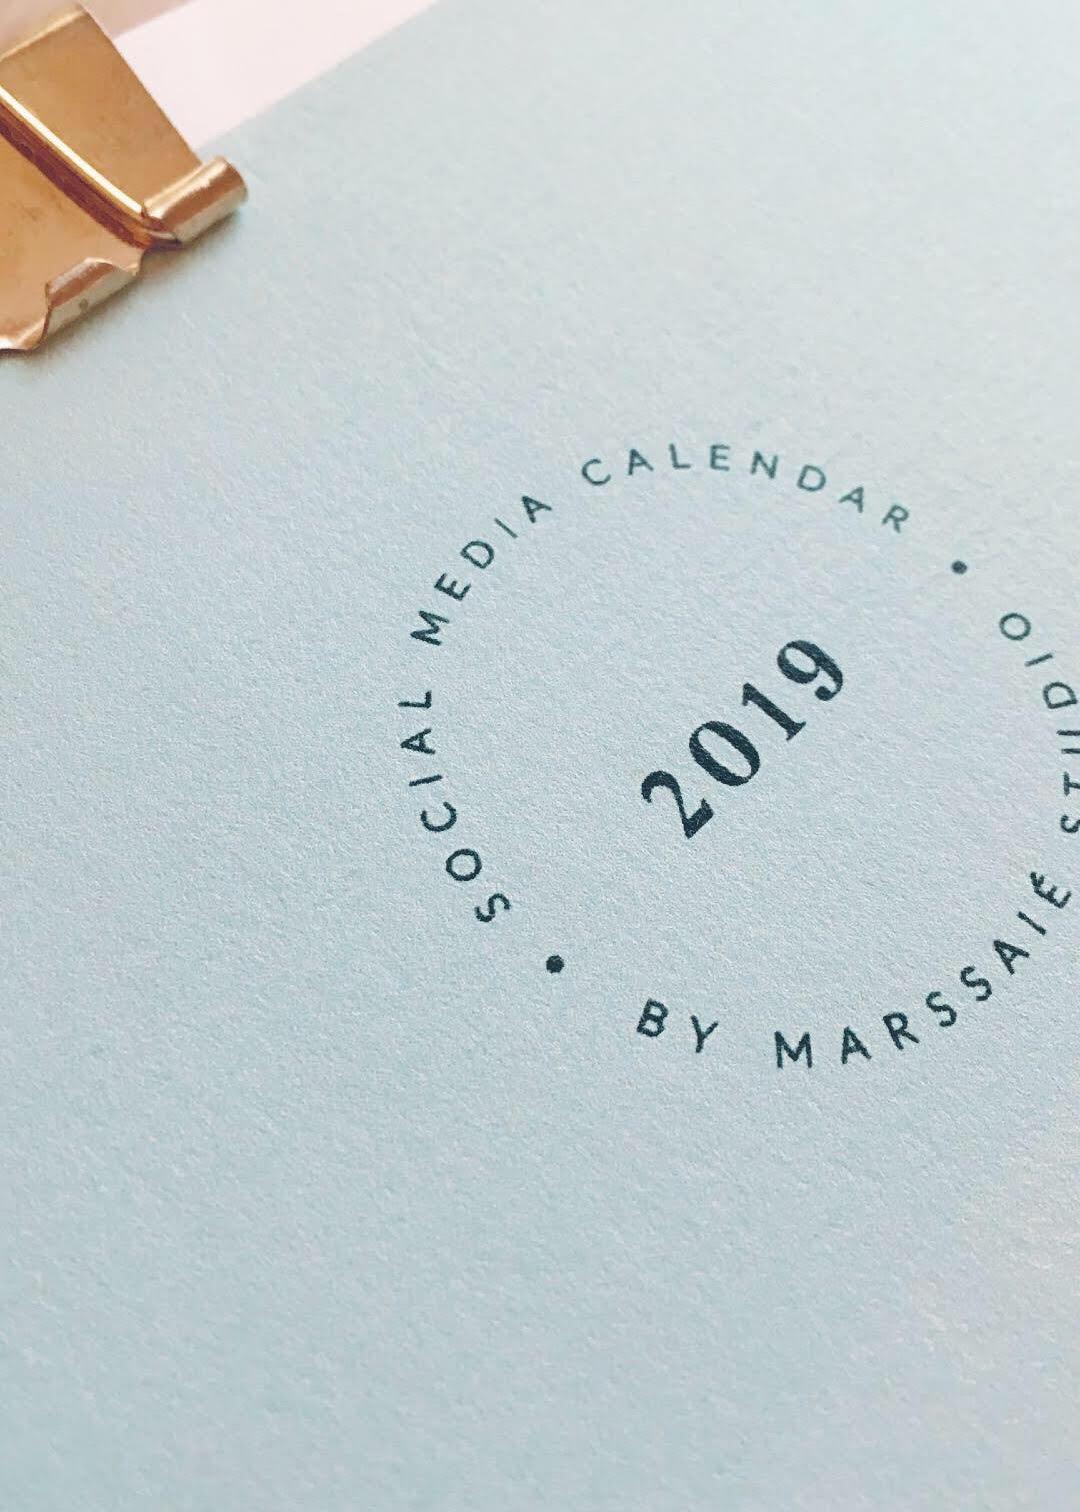 2019-calendar-img-edit.jpg